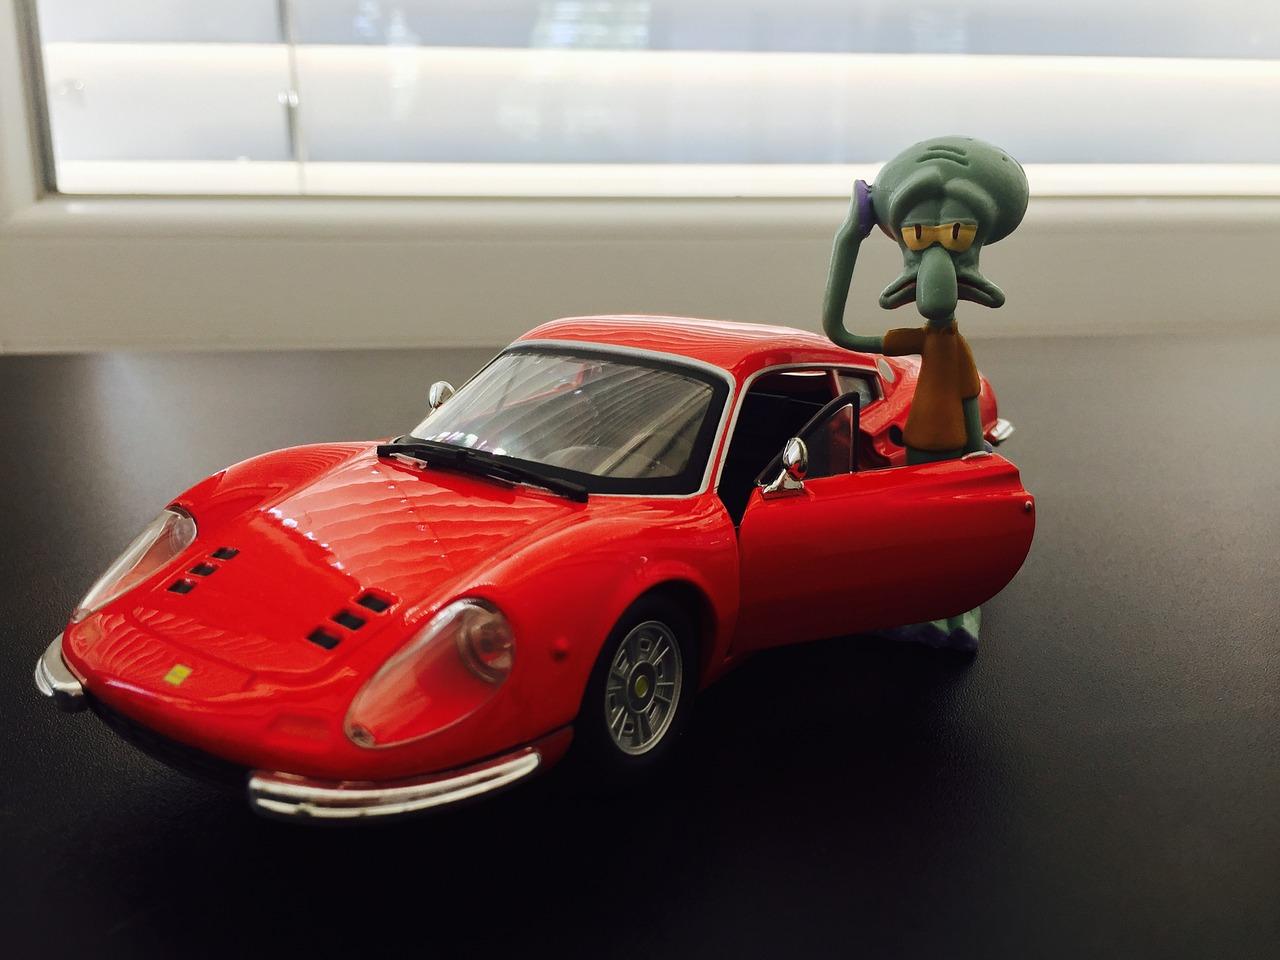 Porsche,squidward,spongebob,sponge,bob - free image from needpix.com